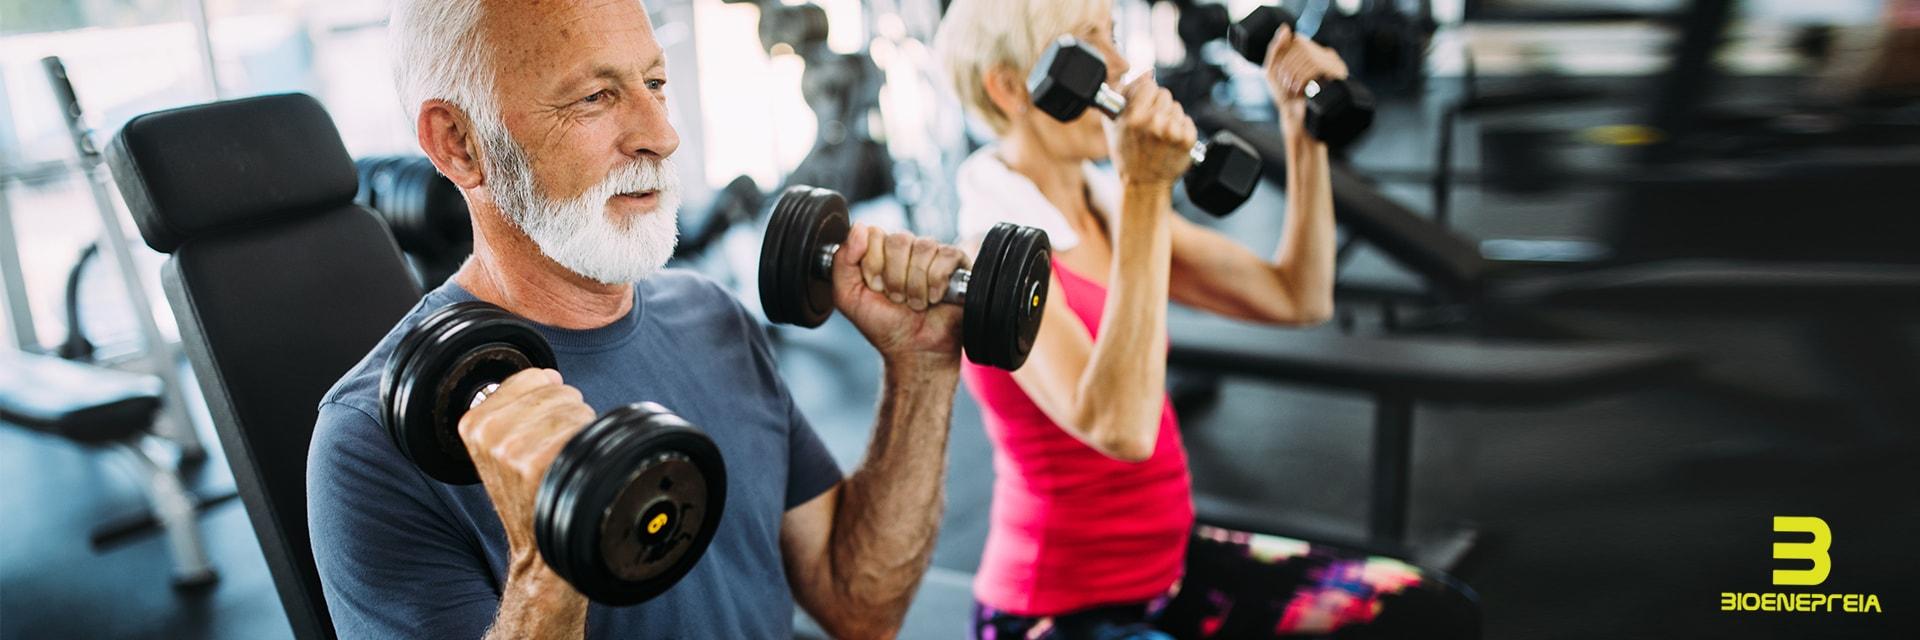 gymnastiki-3ilikia-bioenergia-fc-gym-sparti